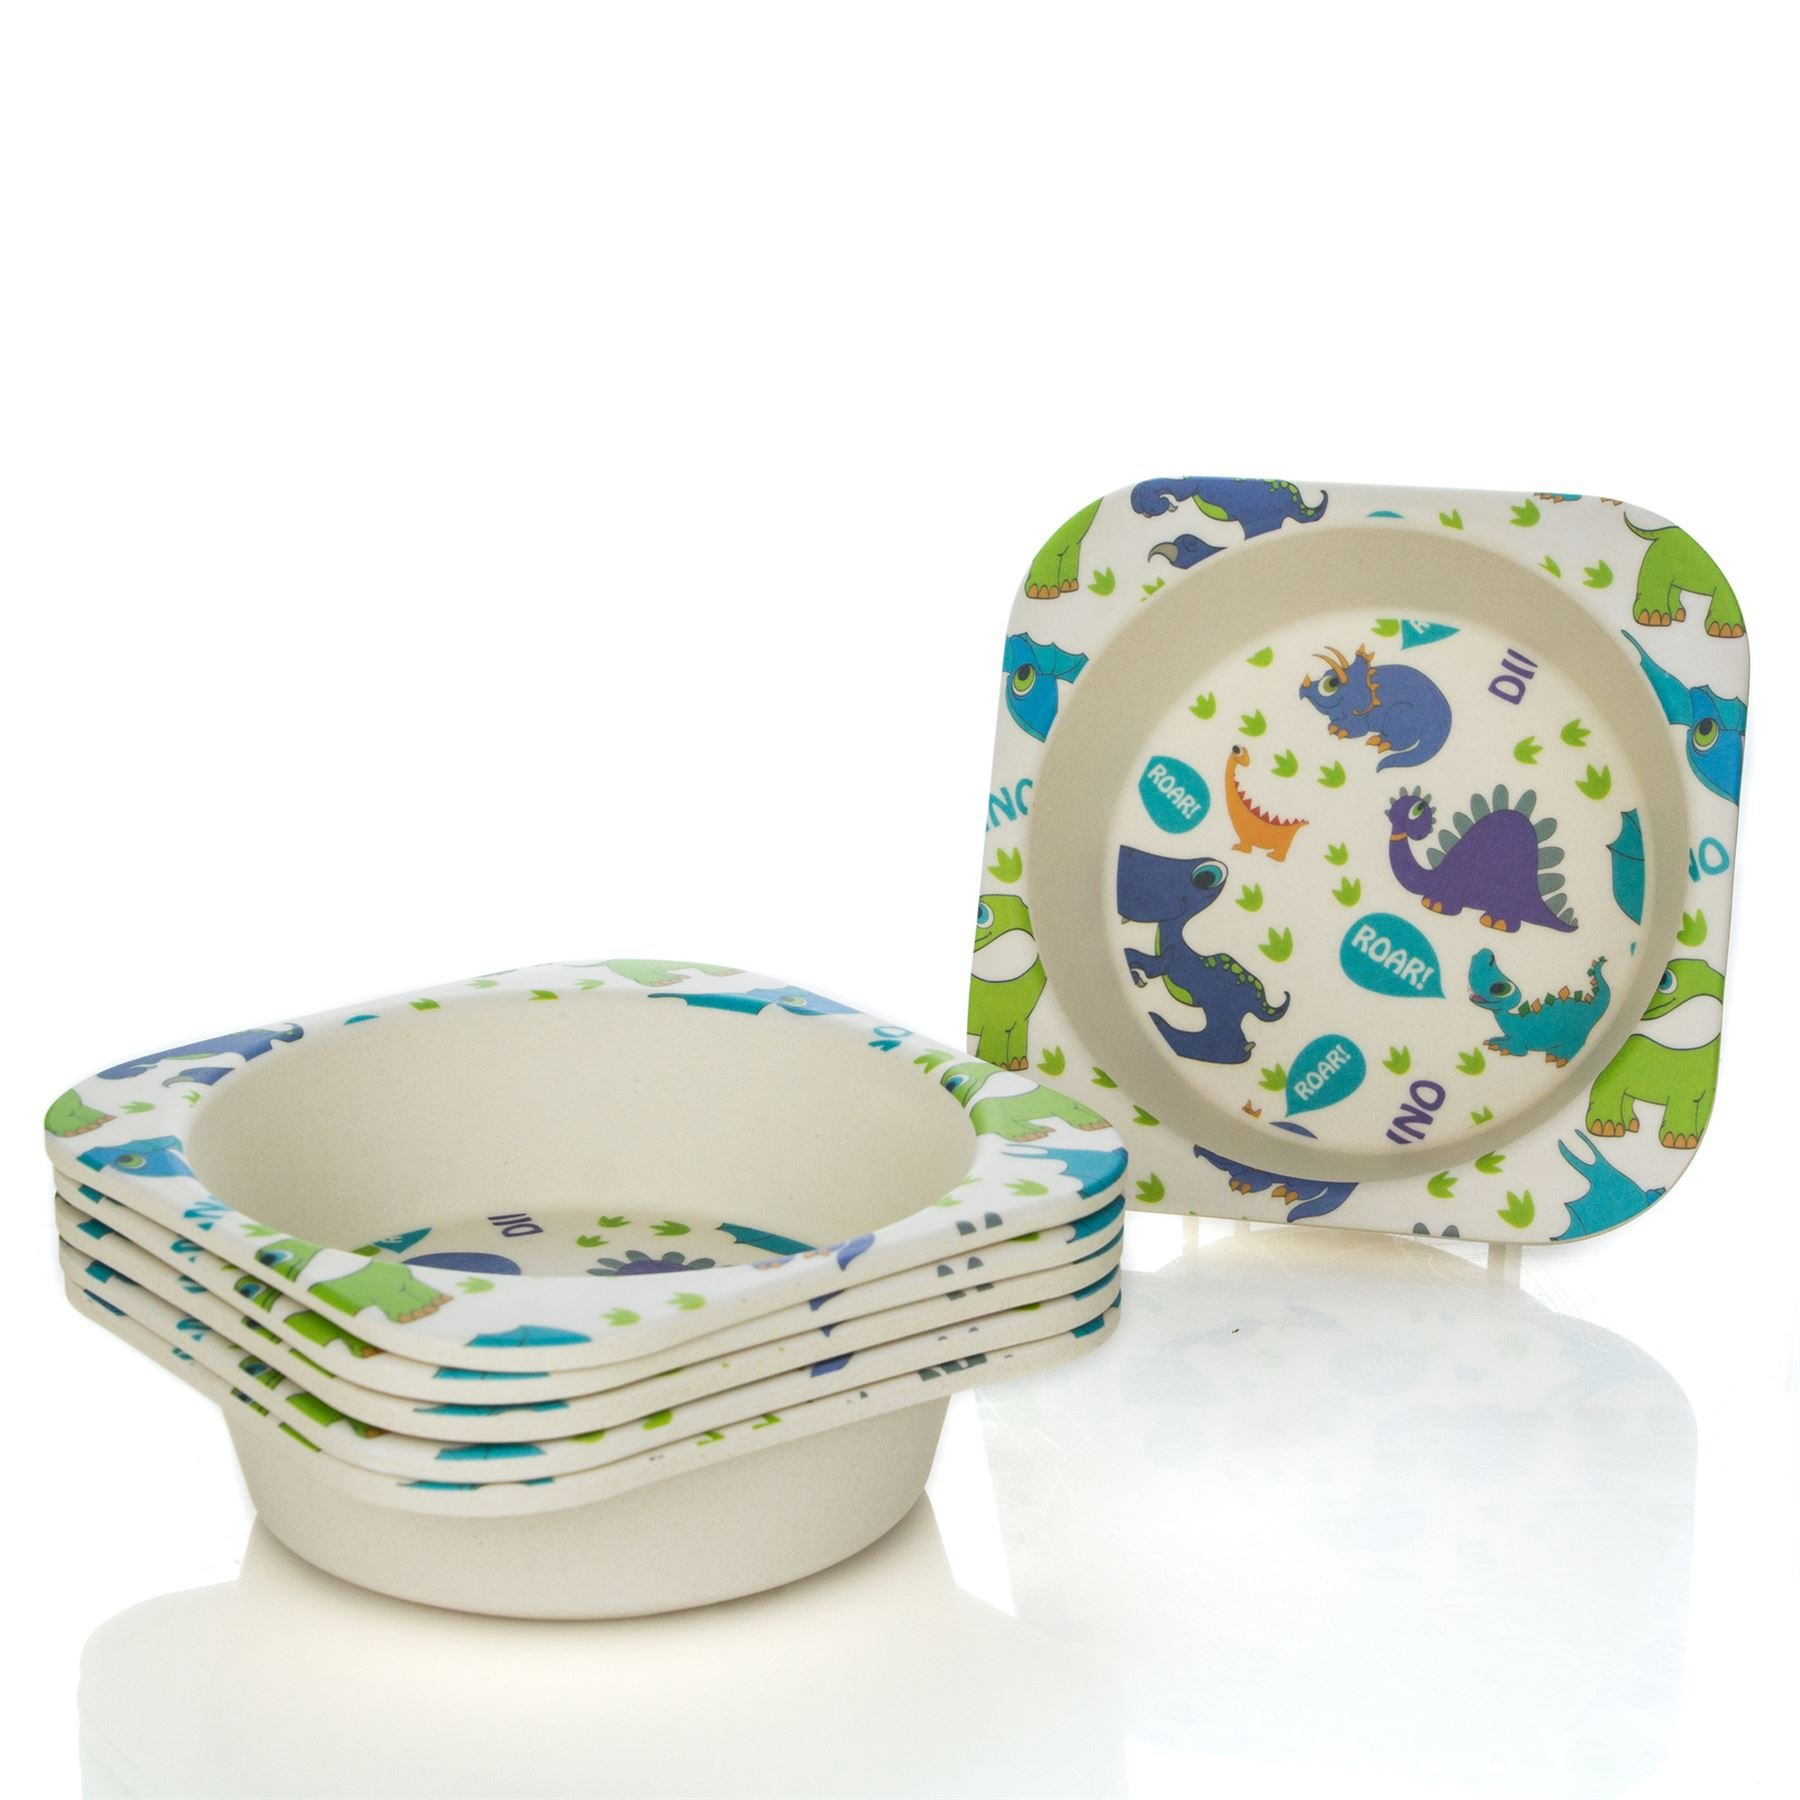 Tiny Dining Children's Bamboo Fibre Dining Bowl - Dinosaur - Pack of 6